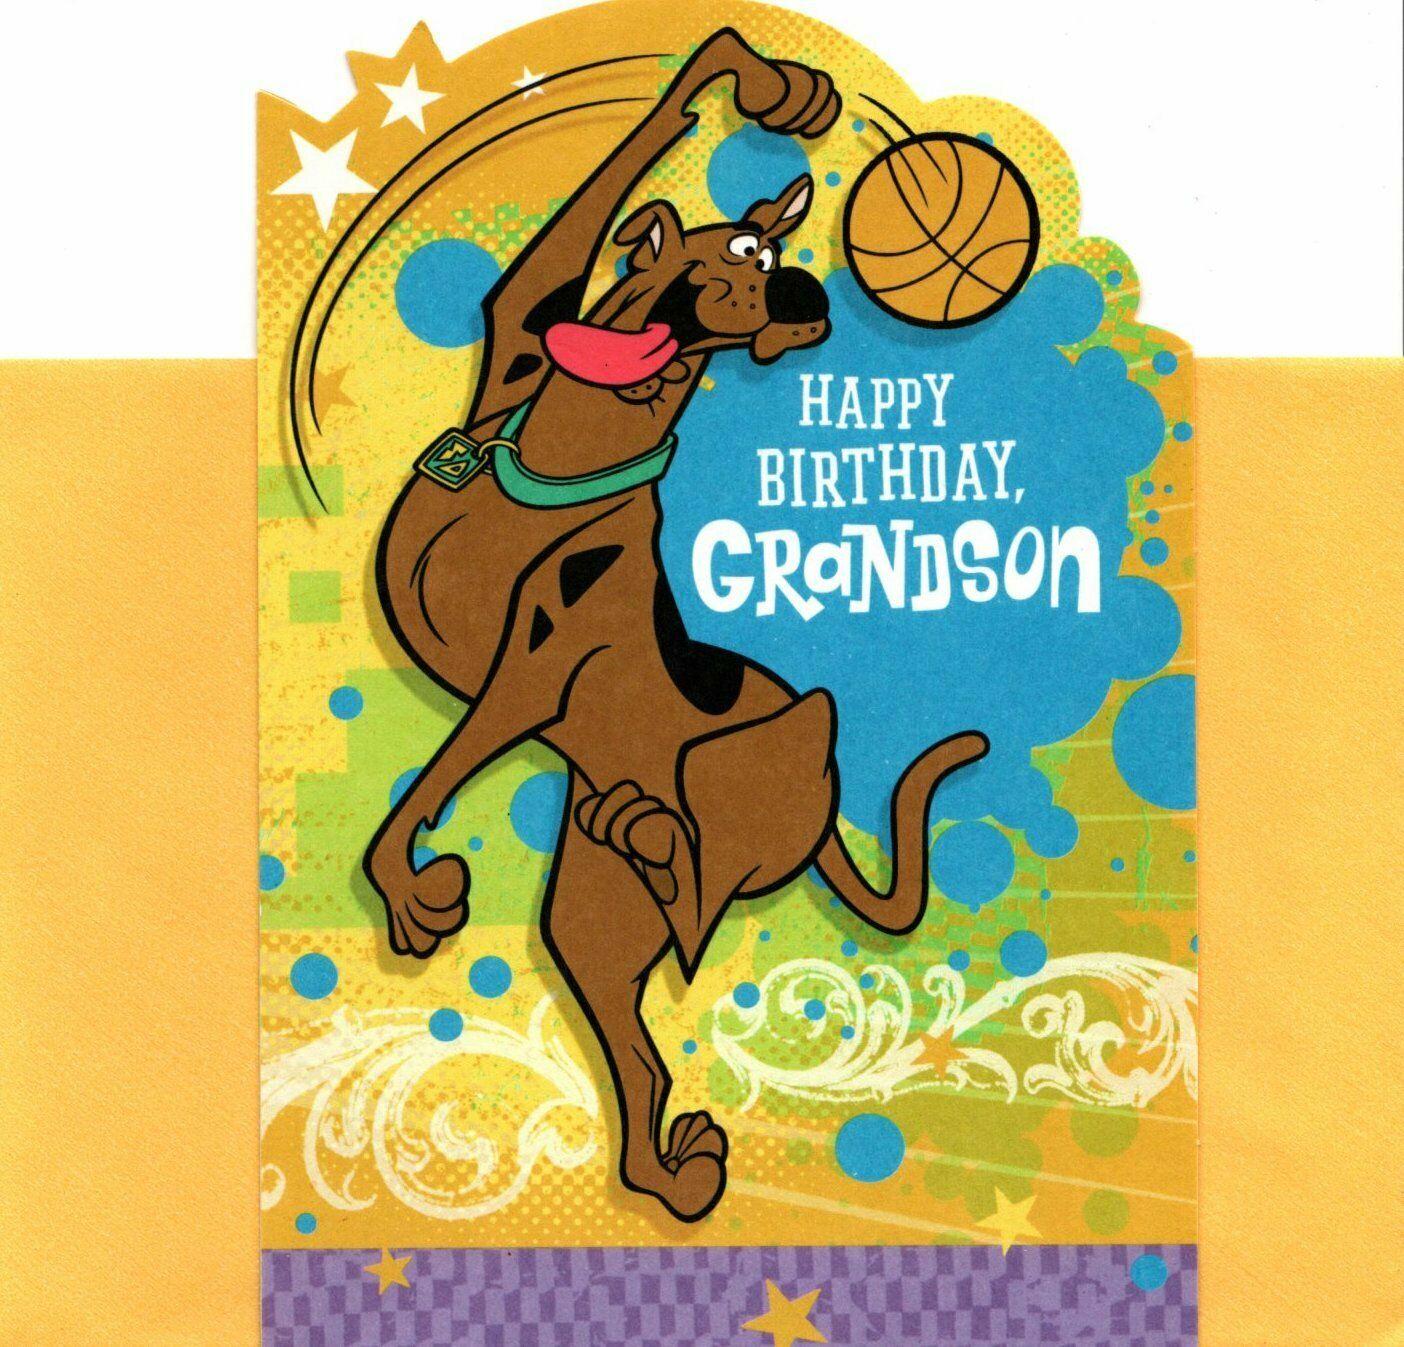 Happy Birthday Grandson Card Hallmark Greeting Card Thoughtful 1 89 Happy Birthday Grandson Hallmark Greeting Cards Grandson Birthday Cards